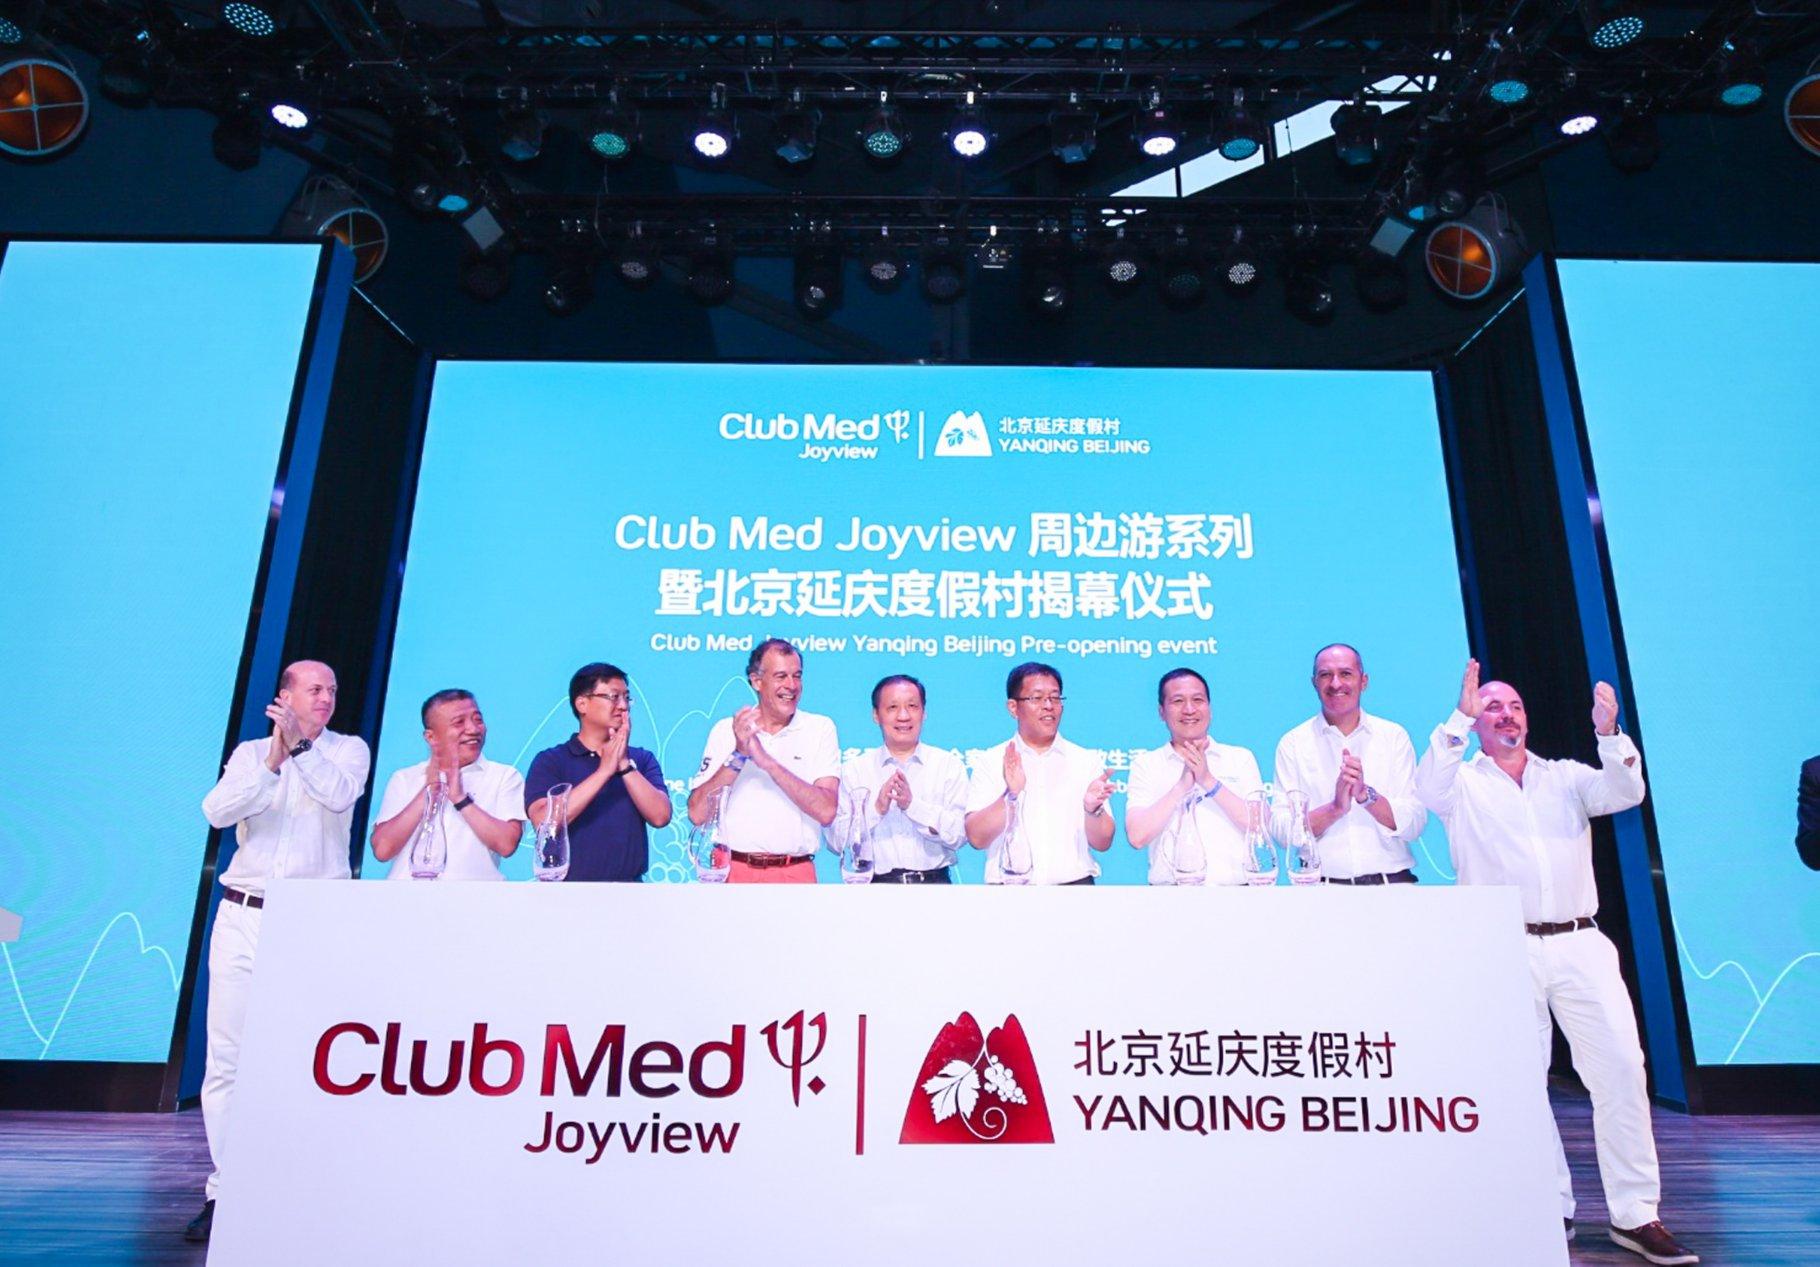 Joyview Yanqing Beijing event